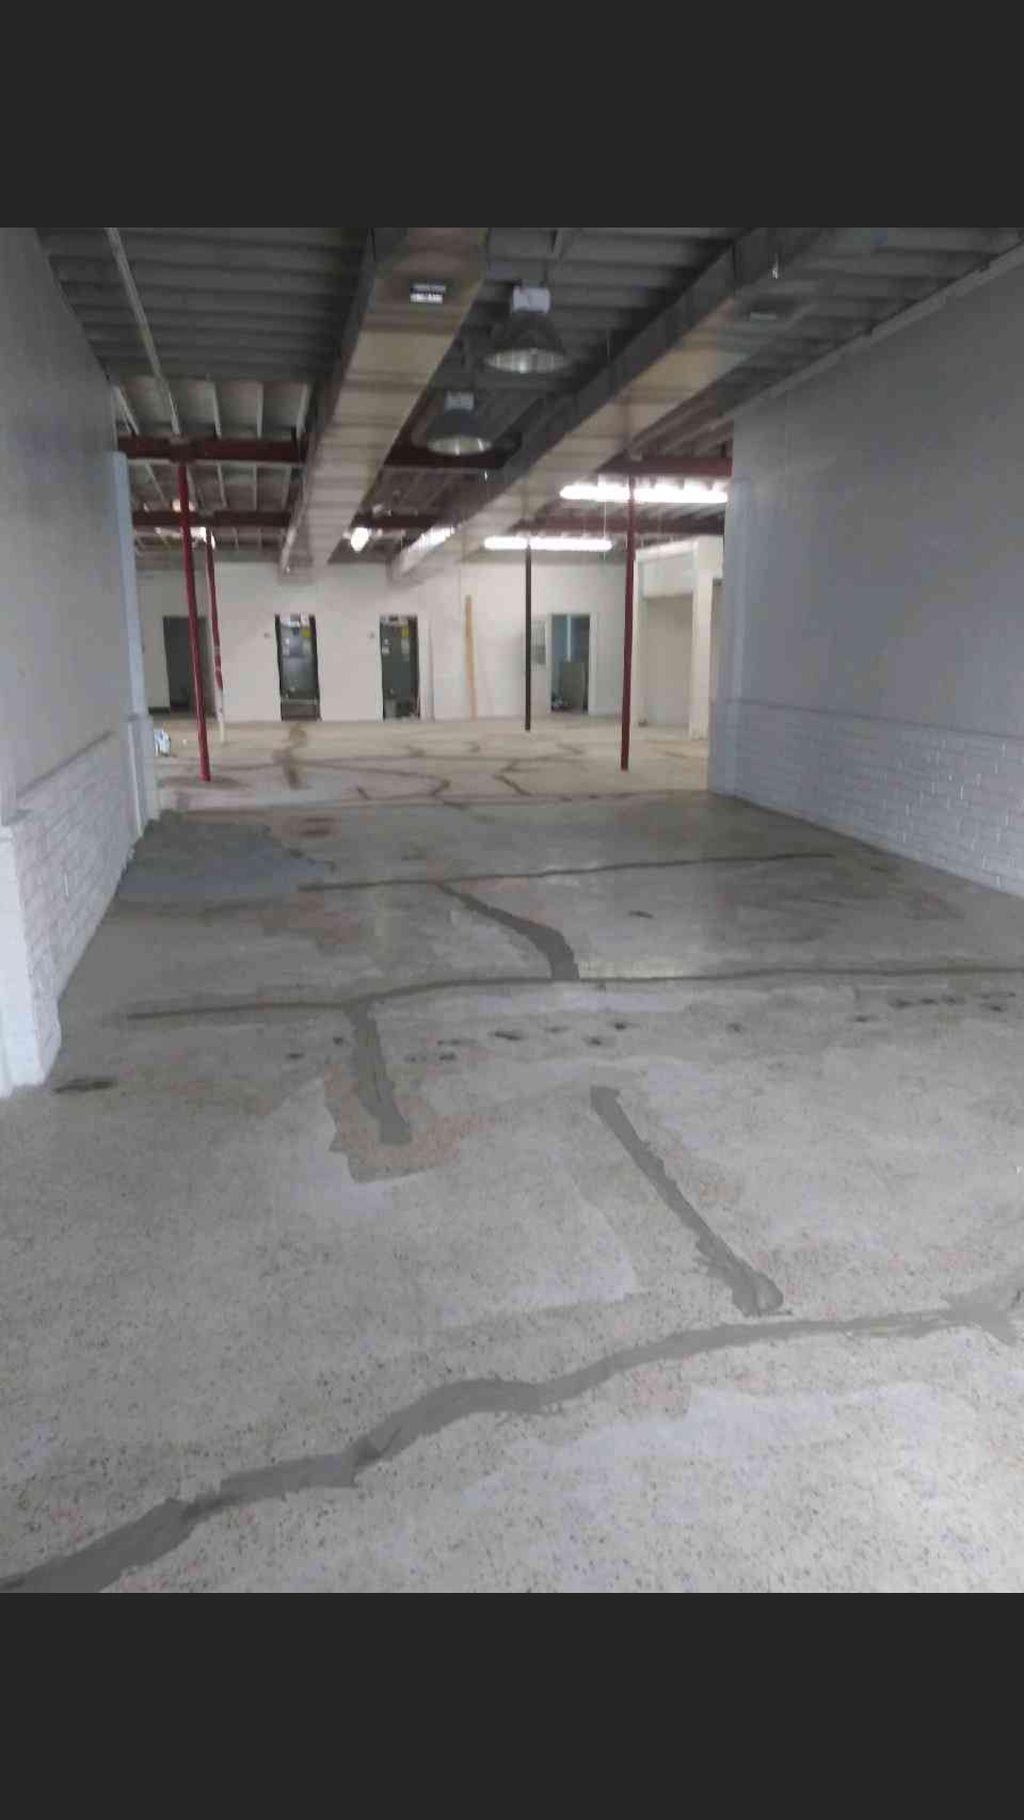 Epoxy floor coating in warehouse